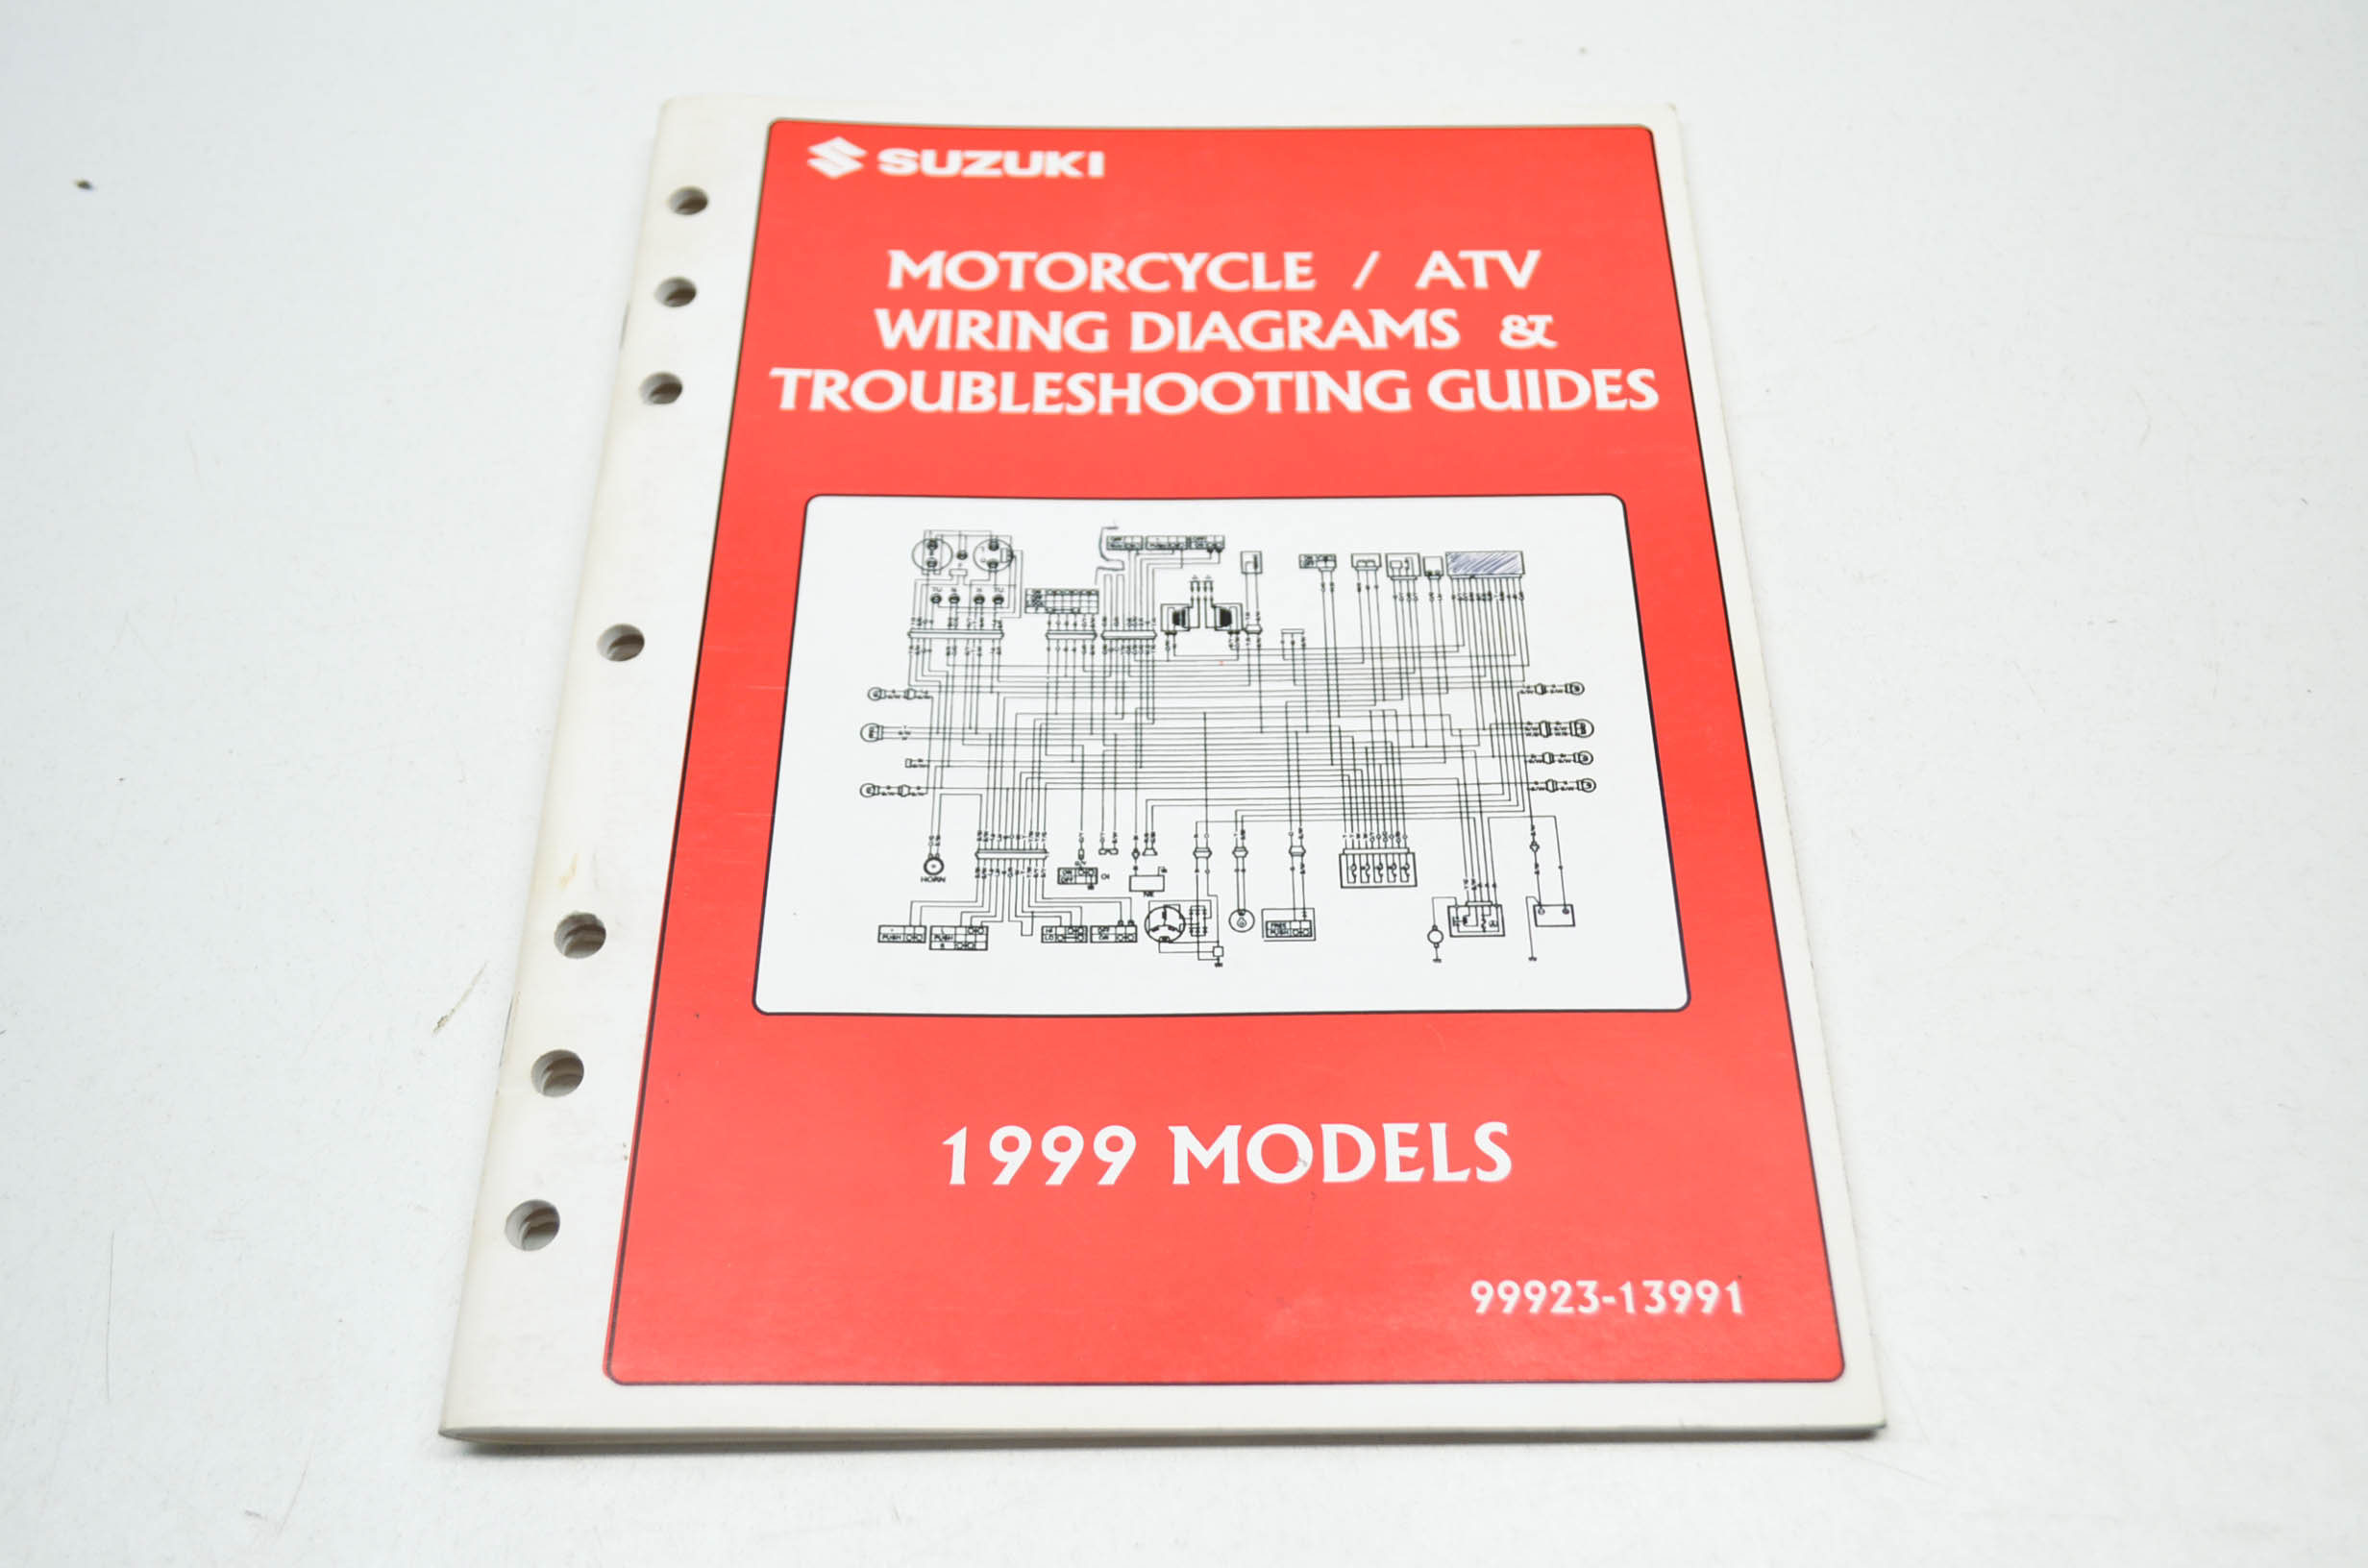 Oem Suzuki 99923-13991 1999 Motorcycle Atv Wiring Diagram Troubleshooting Guide